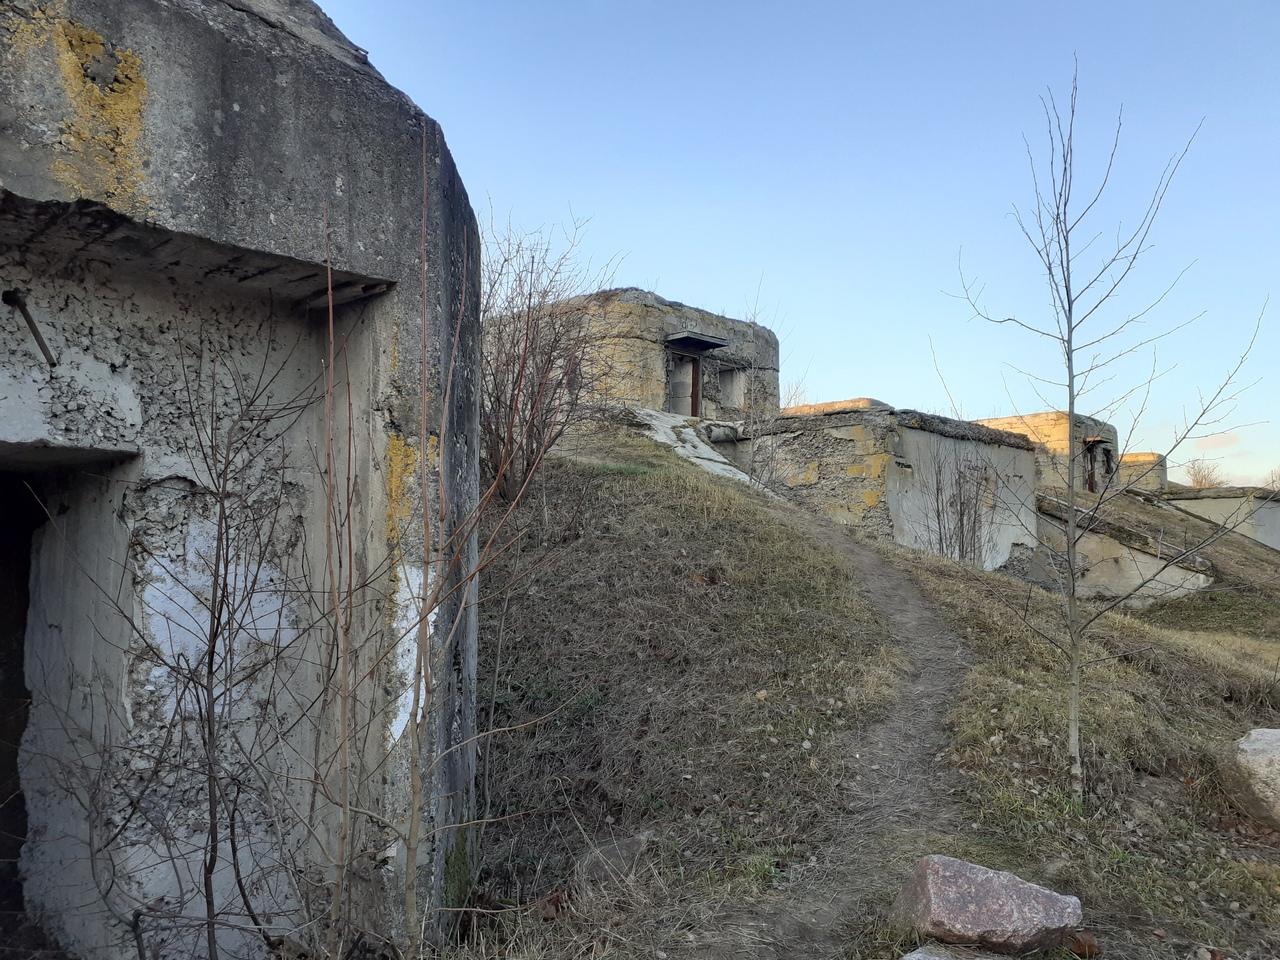 Прогулка на форт Шанц. Один из старейших фортов Кронштадта